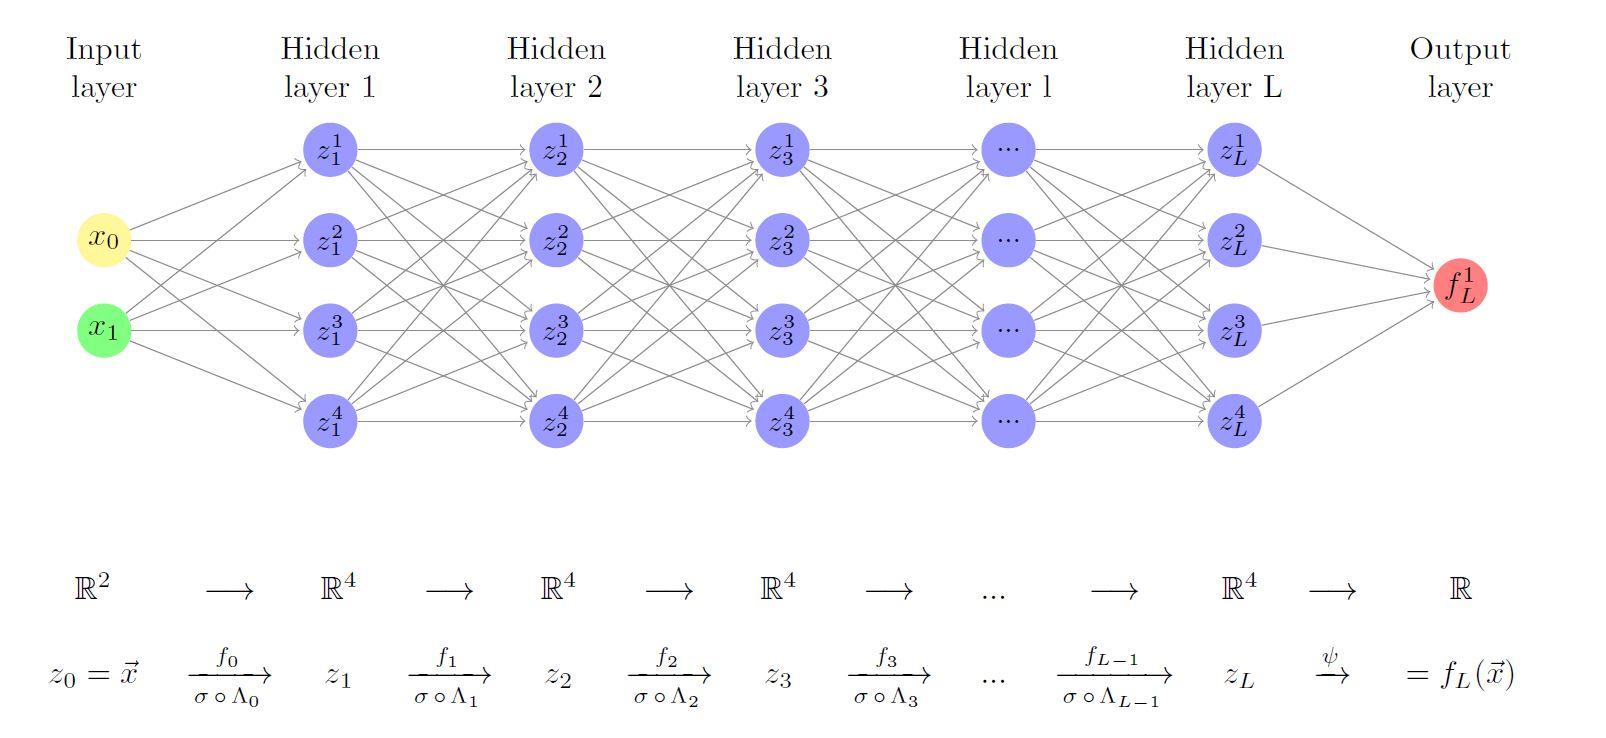 Diagram of a multilayer perceptron